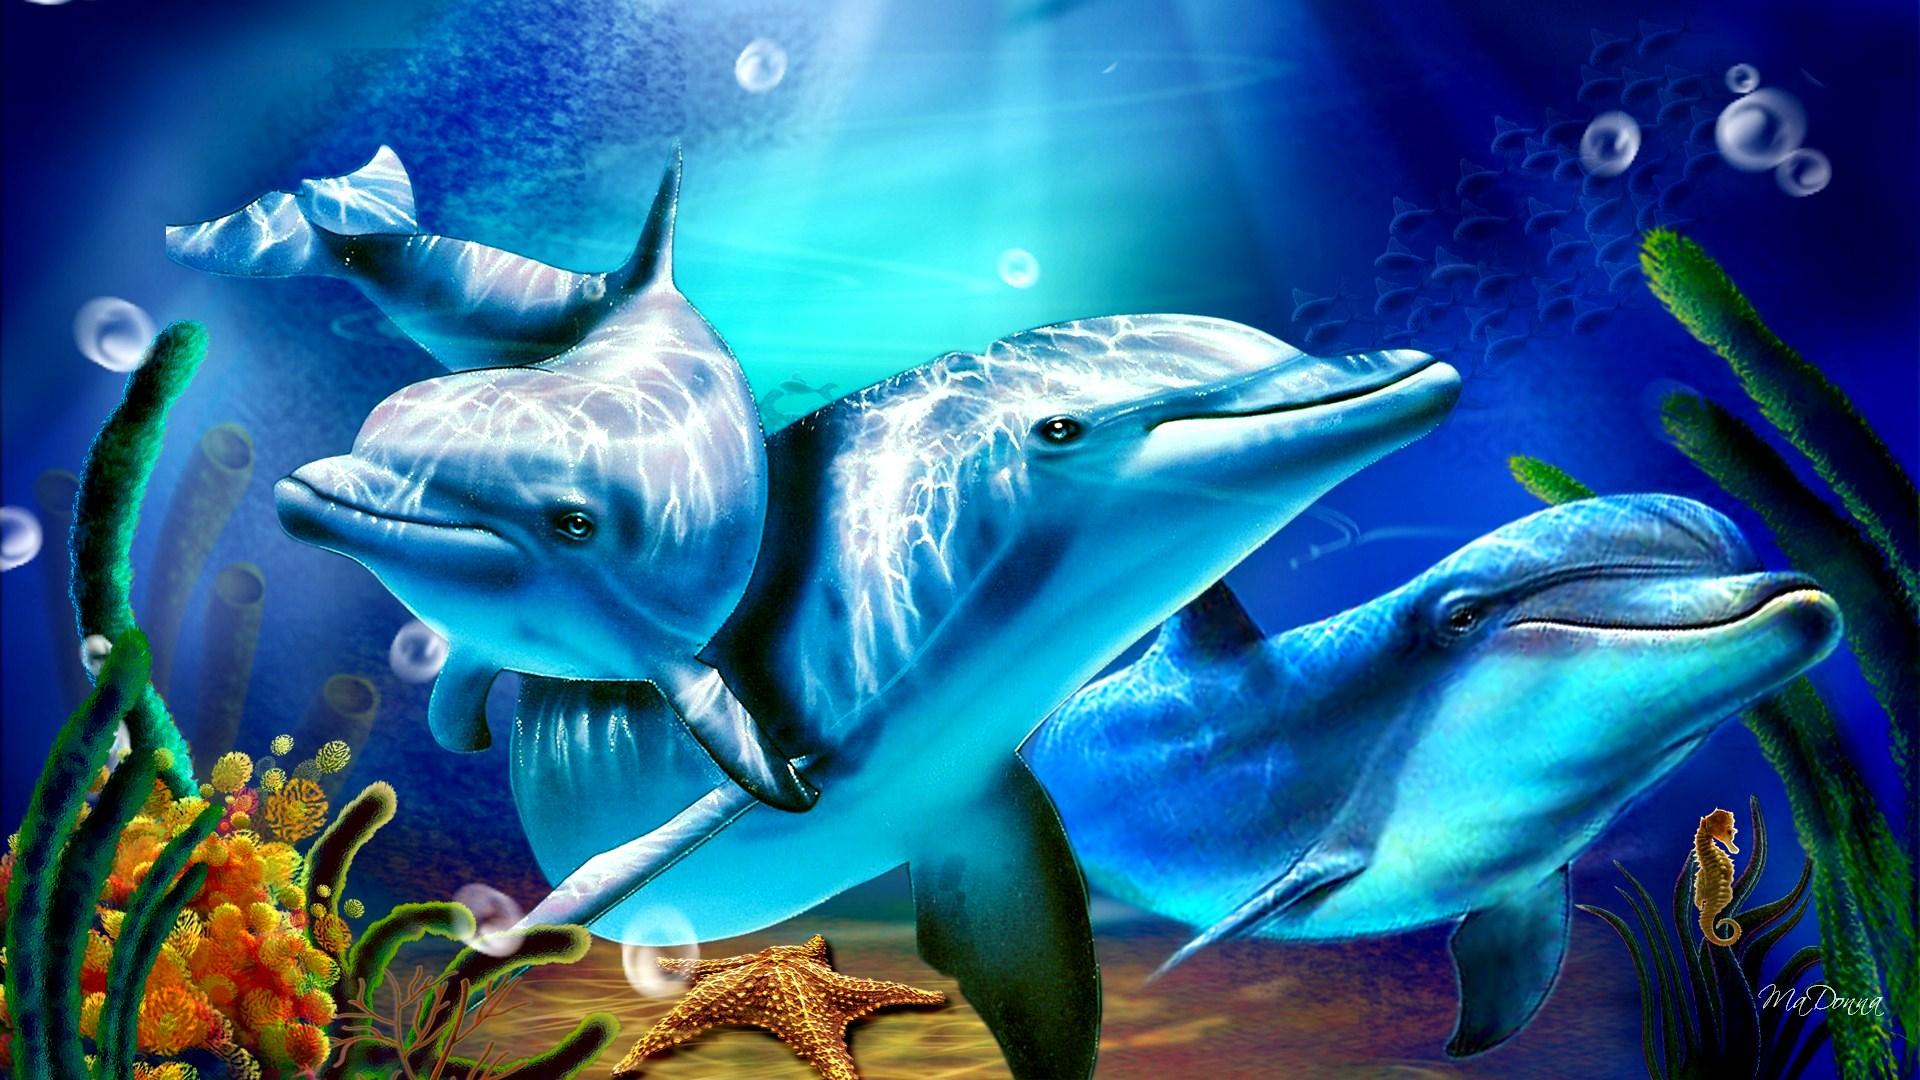 Cute Dolphin Wallpapers Dolphin Wallpaper Image Hd Desktop Wallpapers 4k Hd